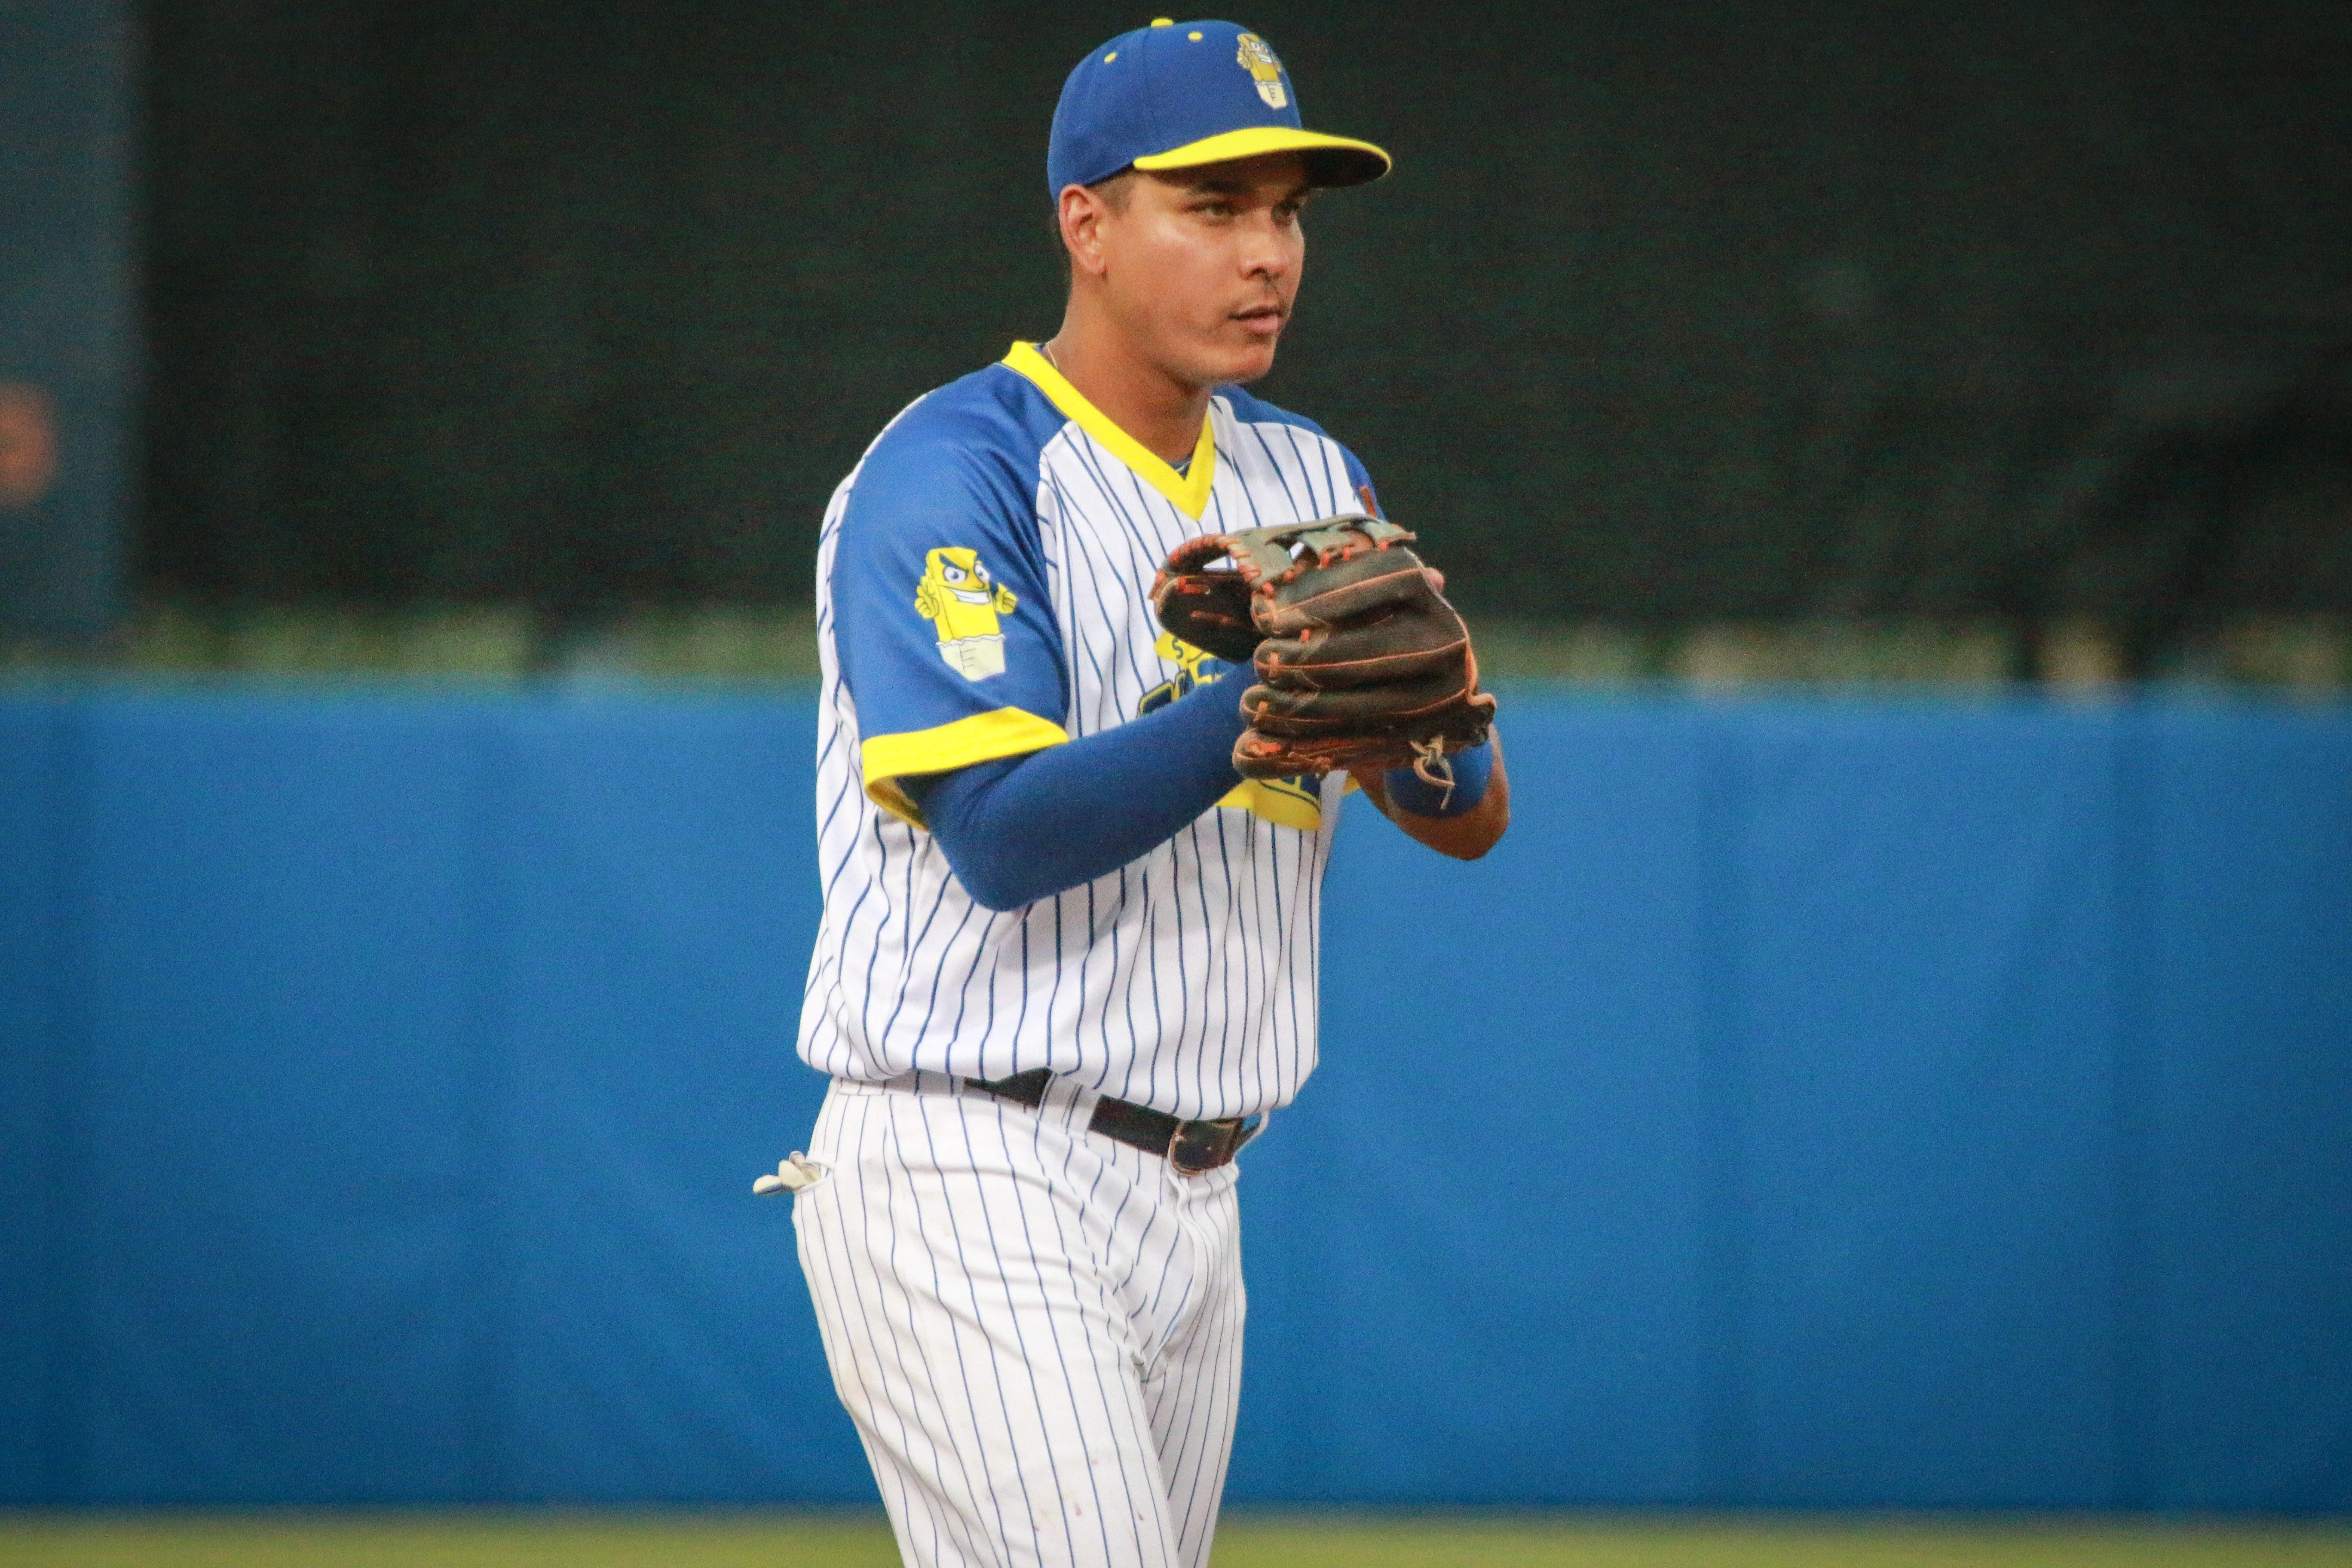 Four years after ghastly injury, Ruben Tejada returns to Mets